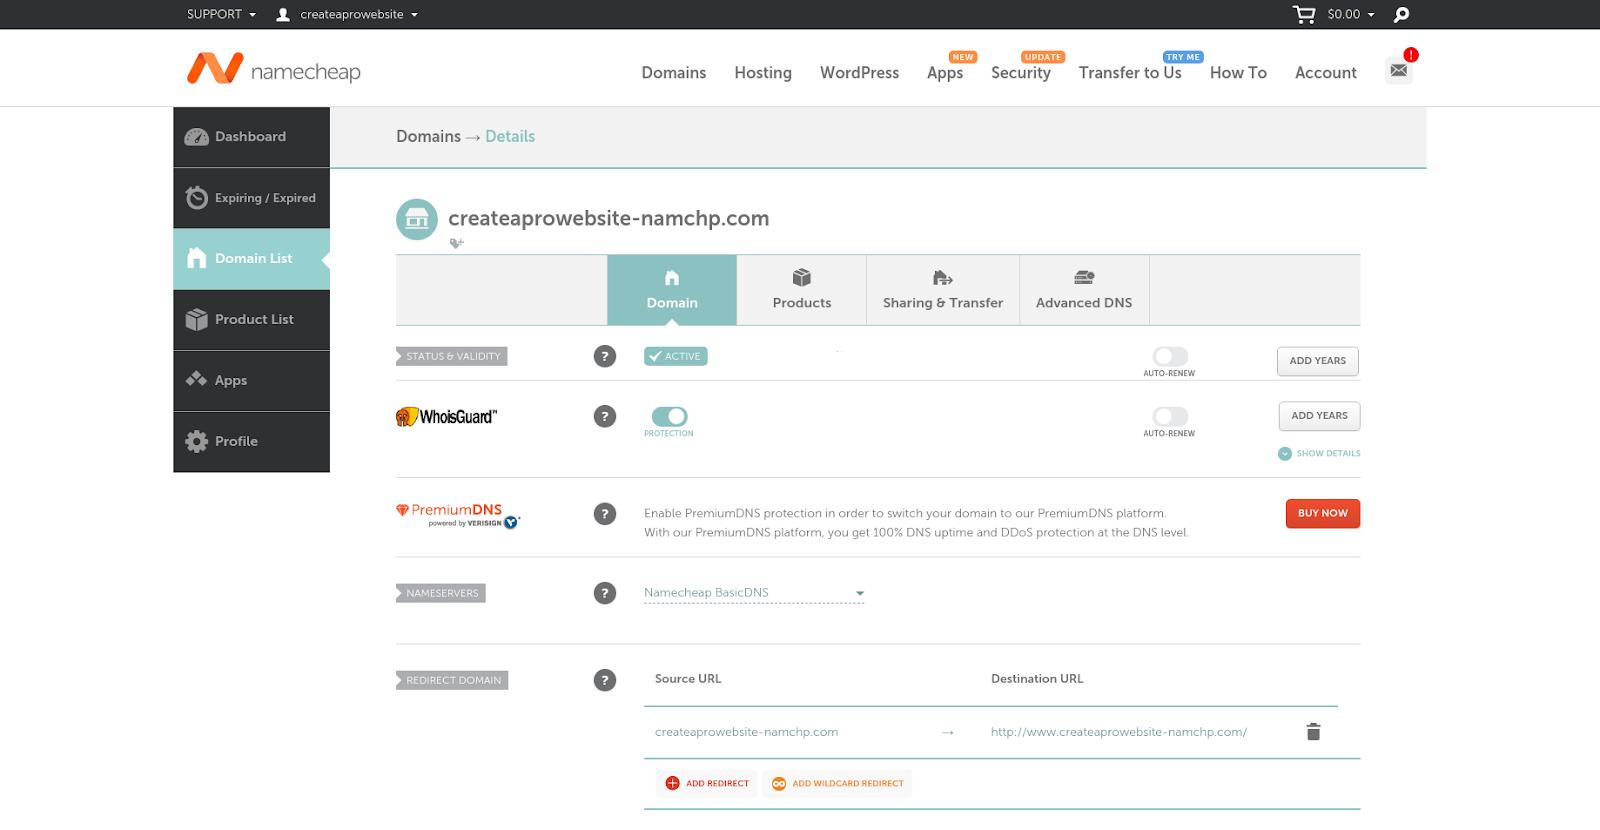 namecheap domain hosting portal